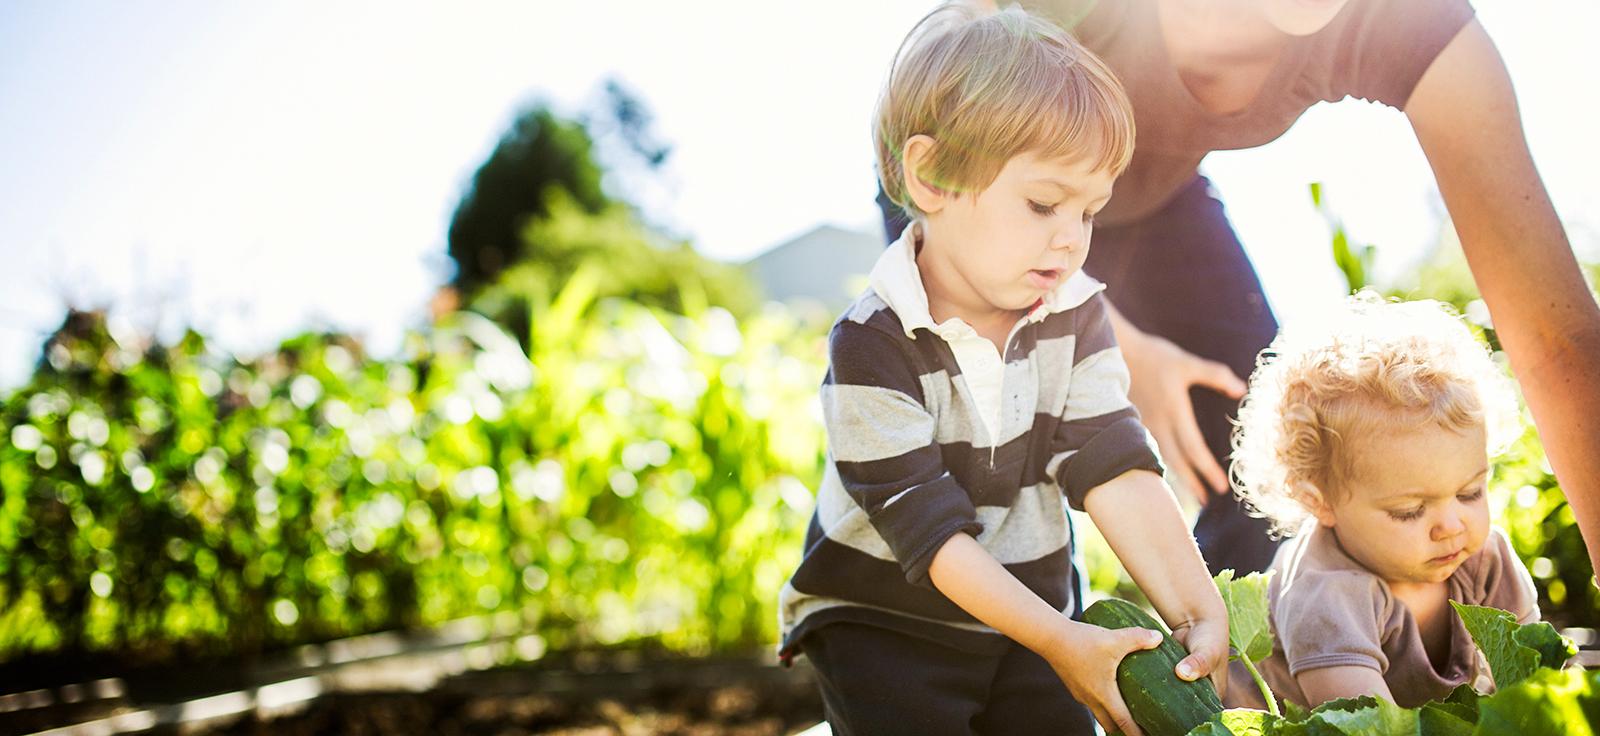 children helping mom with gardening